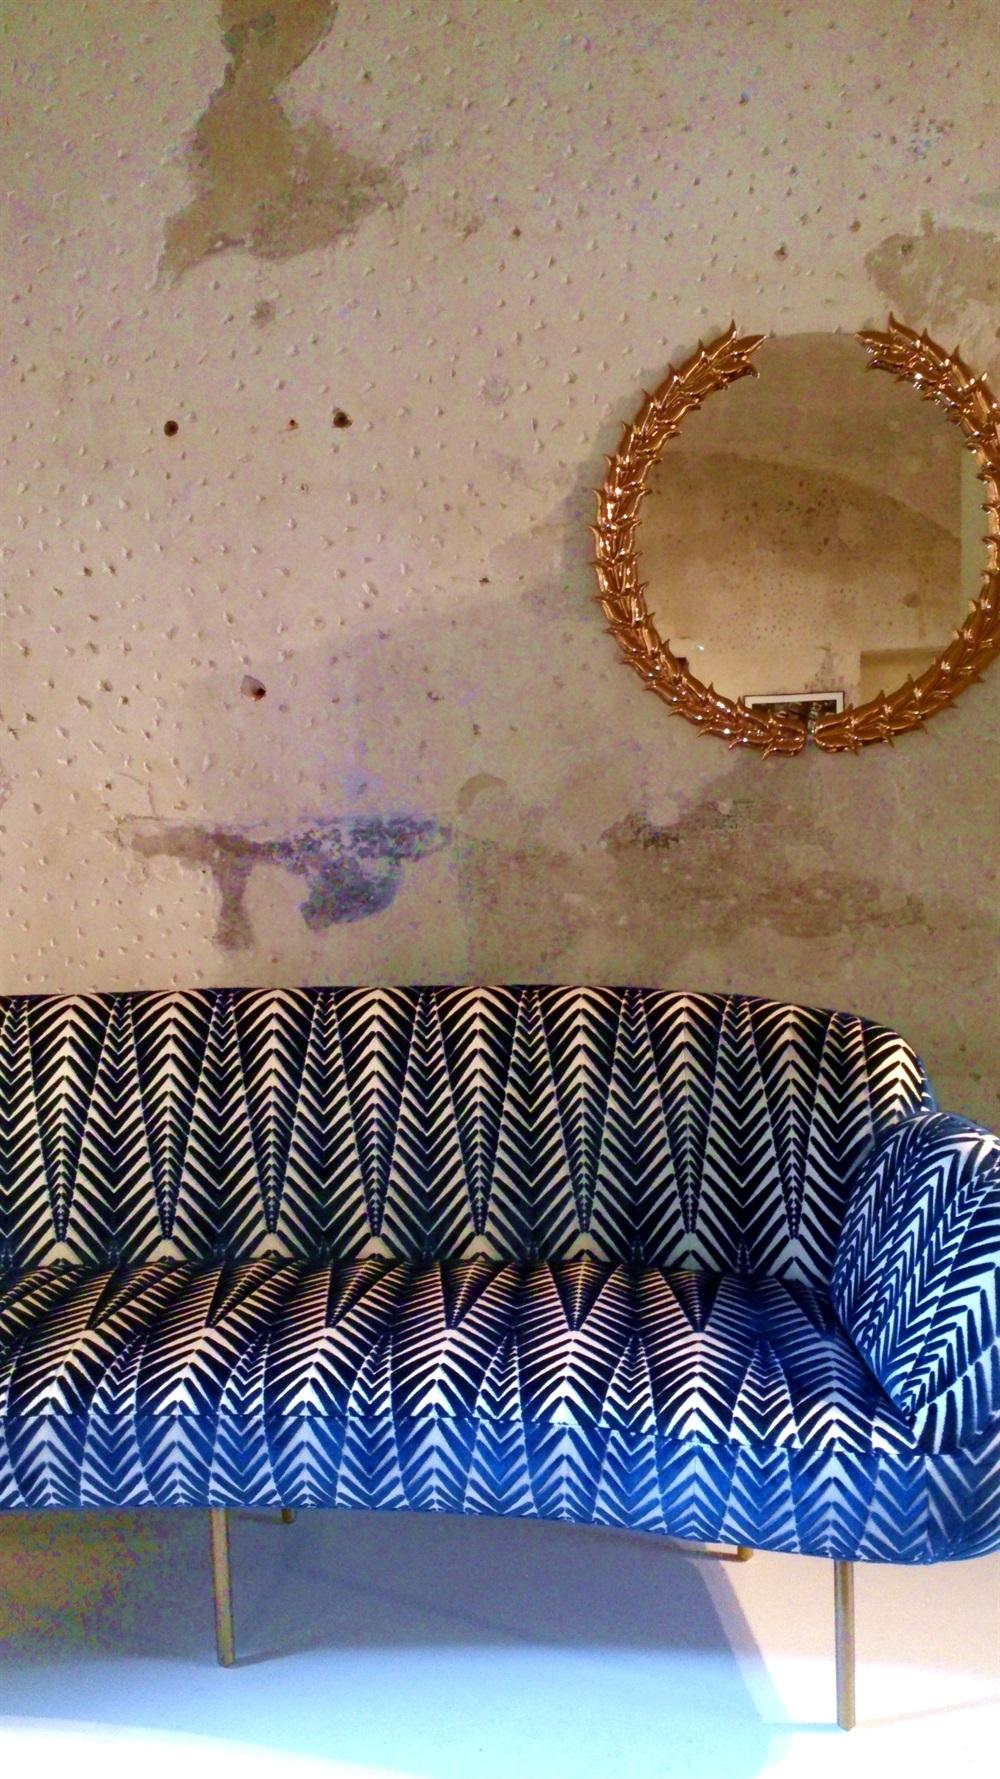 14 fuorisalone milan design week 2015 rossana orlandi nika zupanc gufram marimekko scarlet splendour interior design luxurious furniture meble luksusowe projektowanie marcel wanders